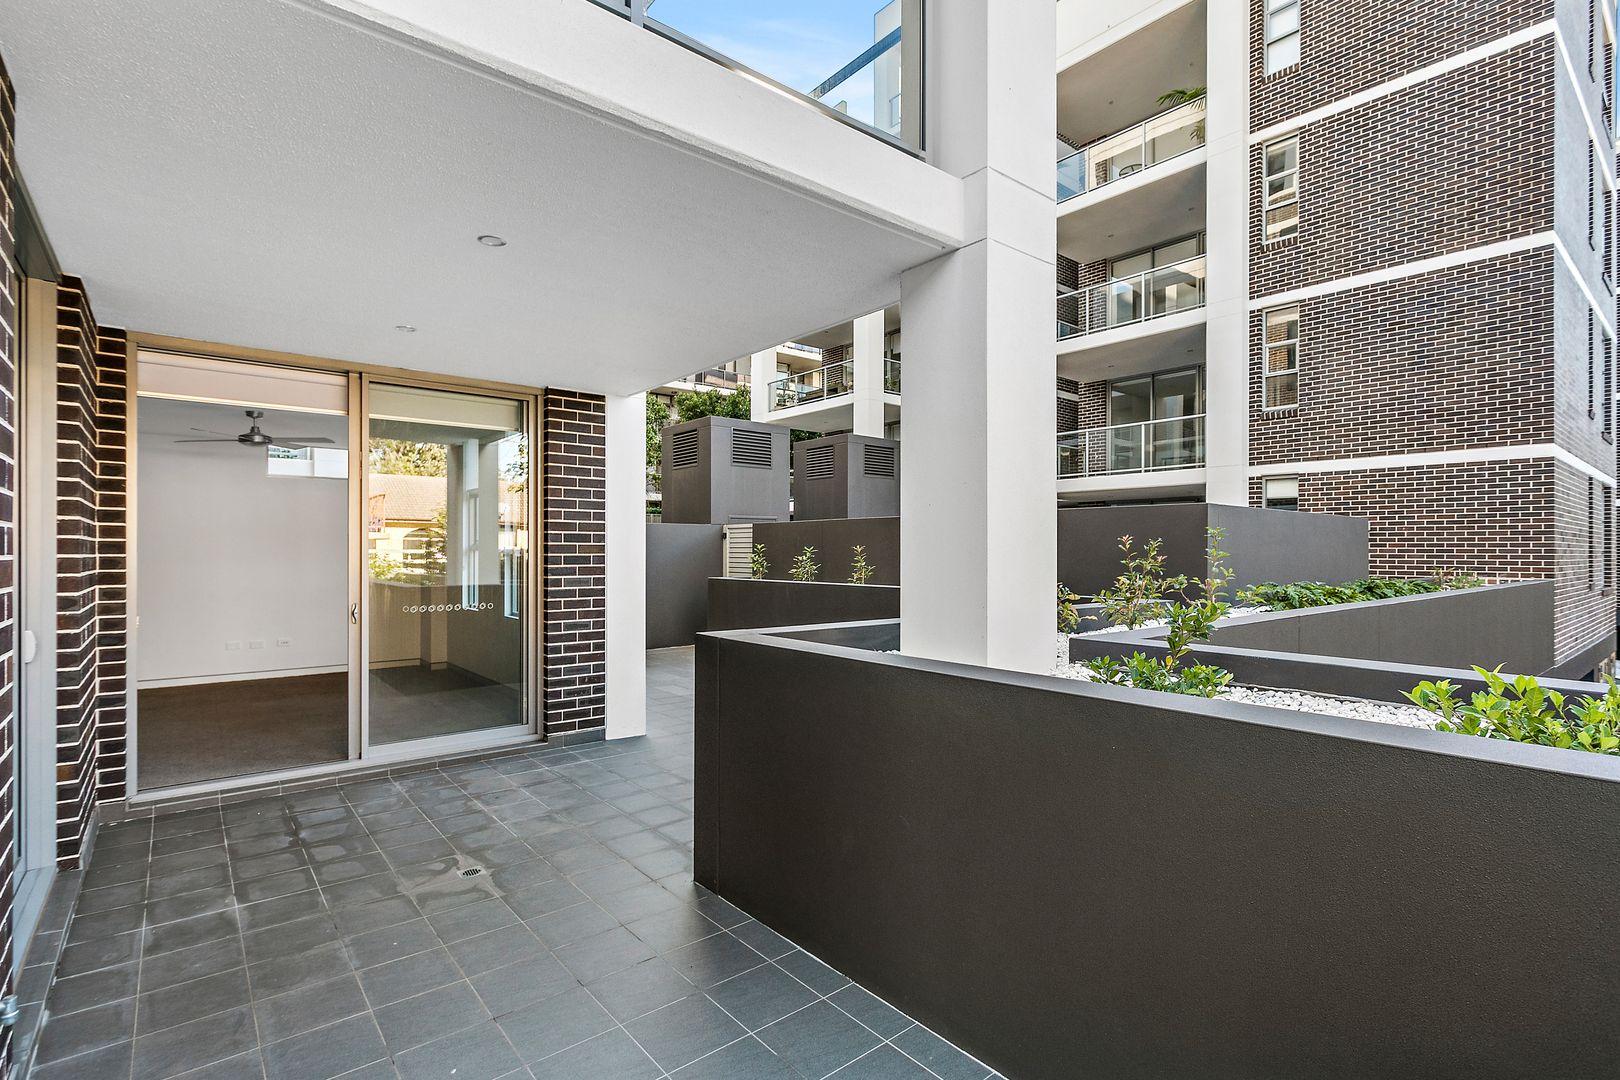 B101/24 Kembla Street, Wollongong NSW 2500, Image 0